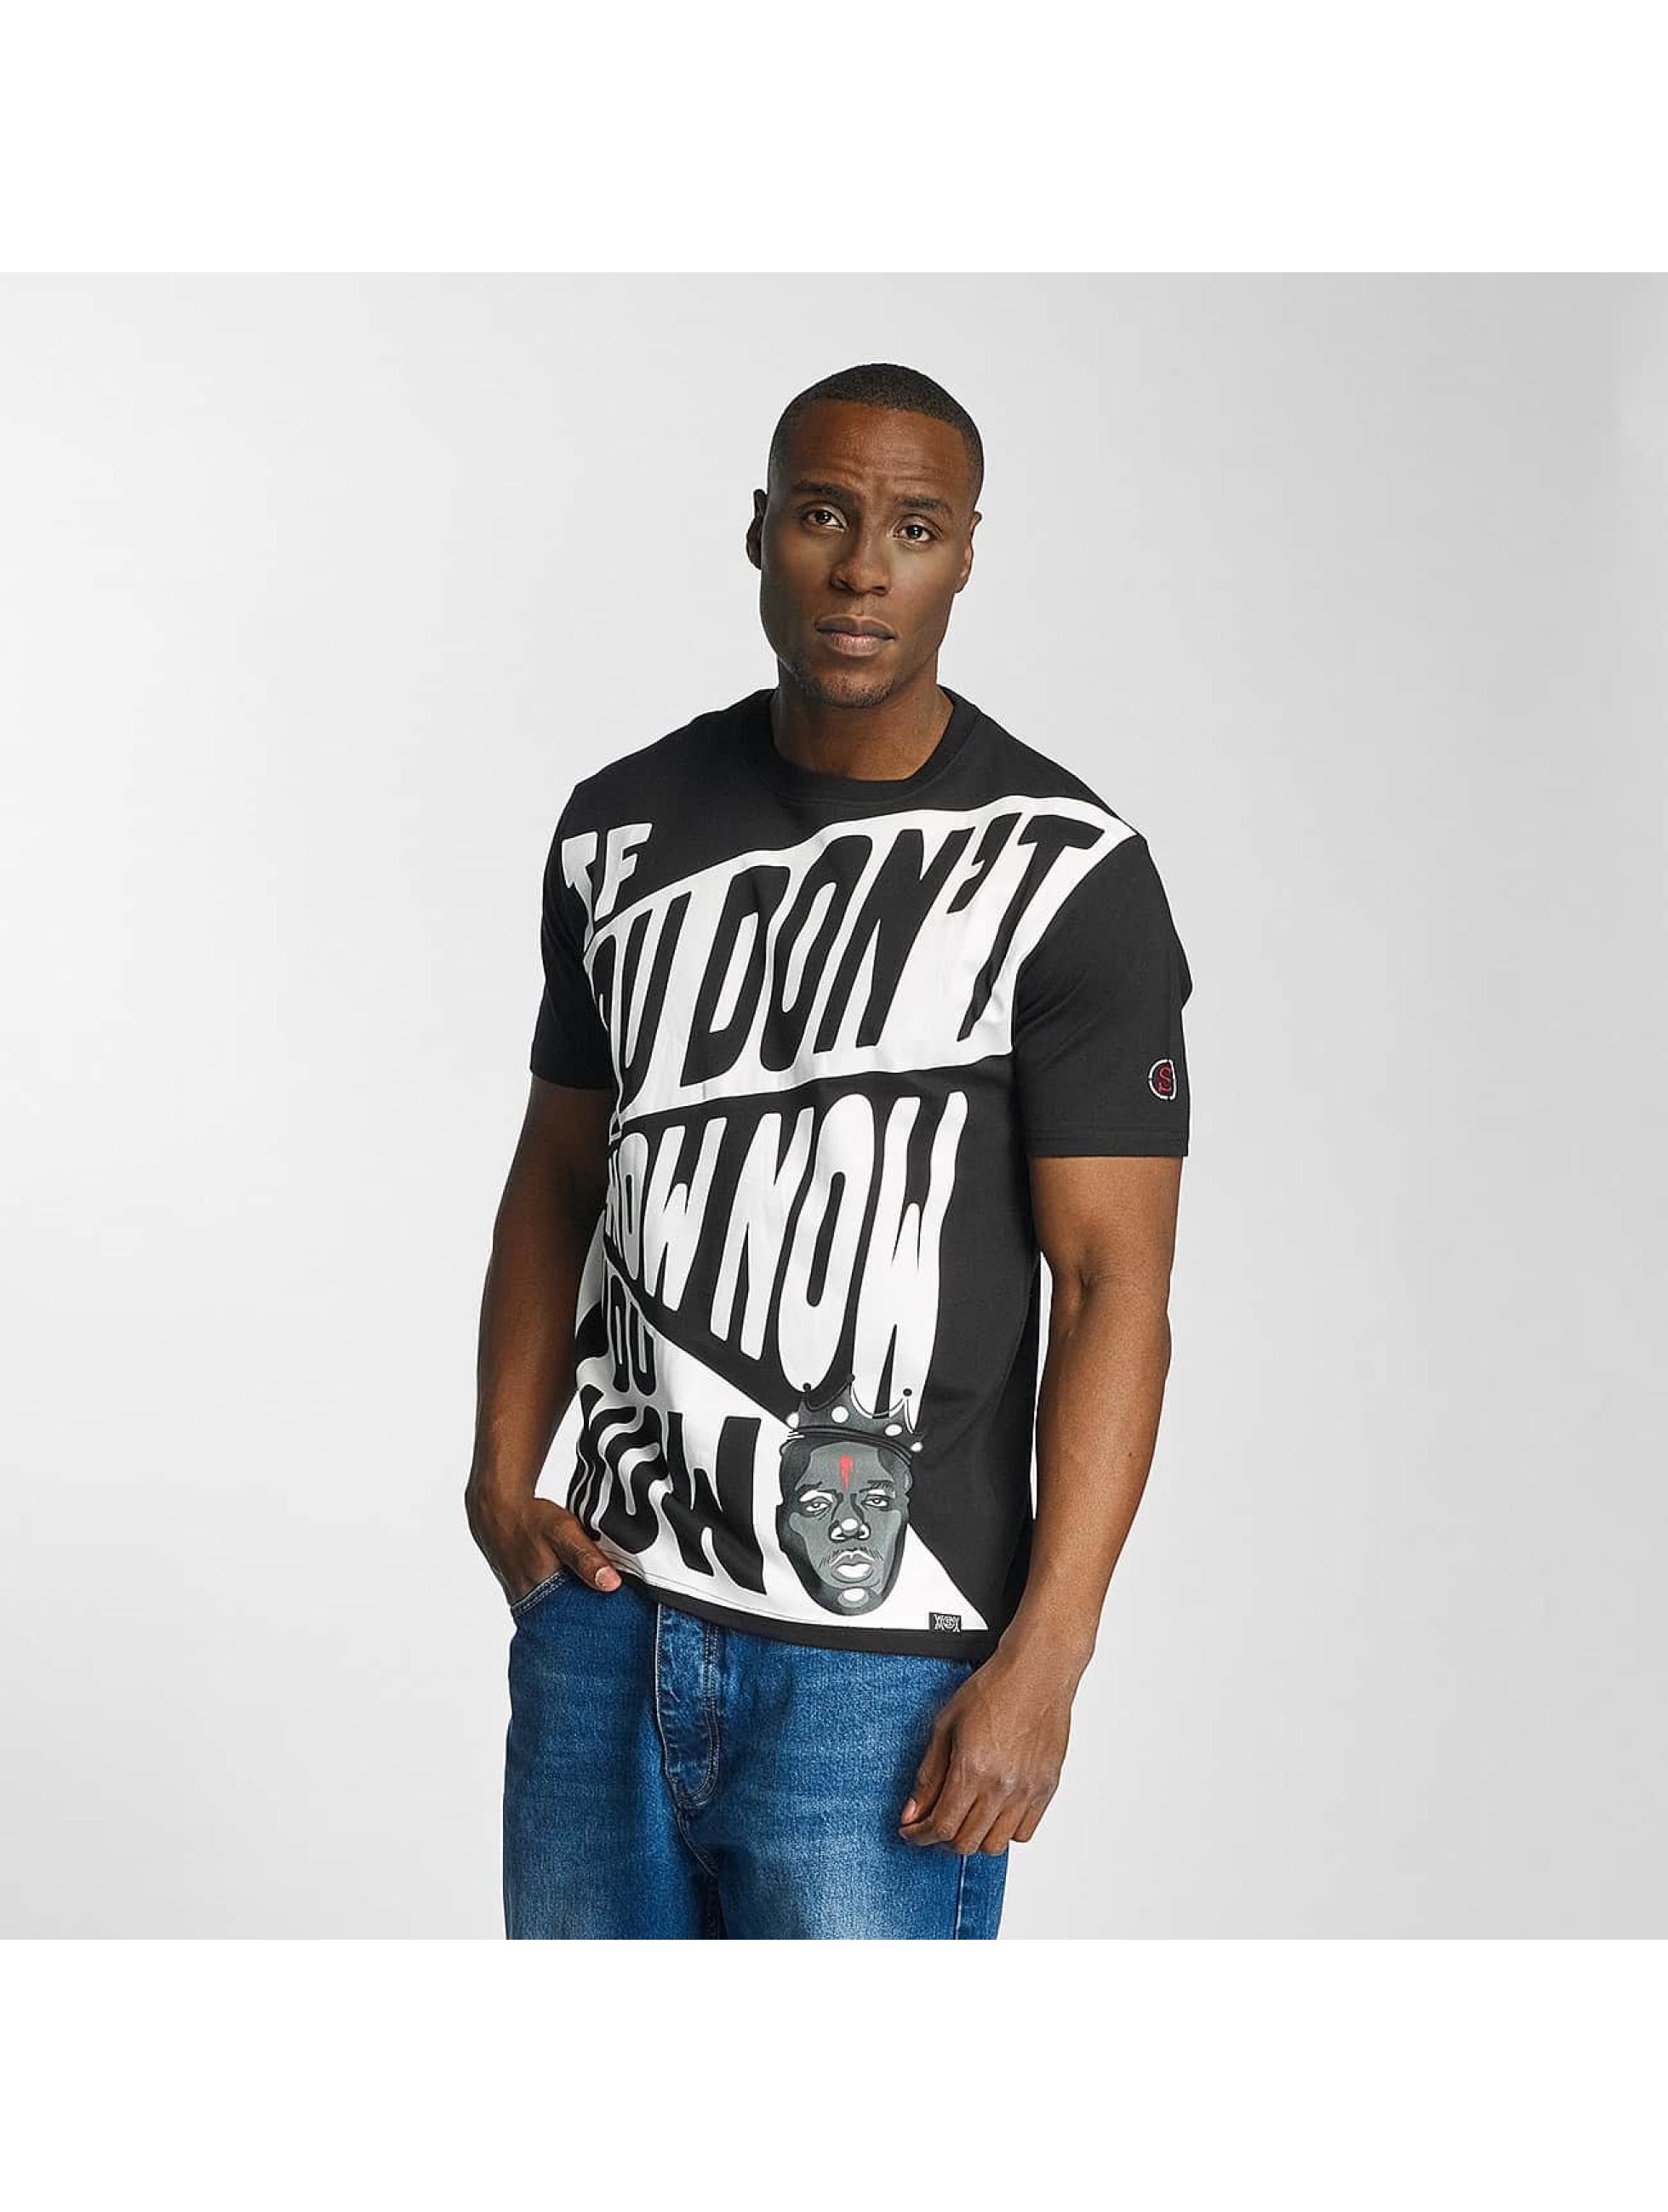 Who Shot Ya? T-Shirt YouKnow black